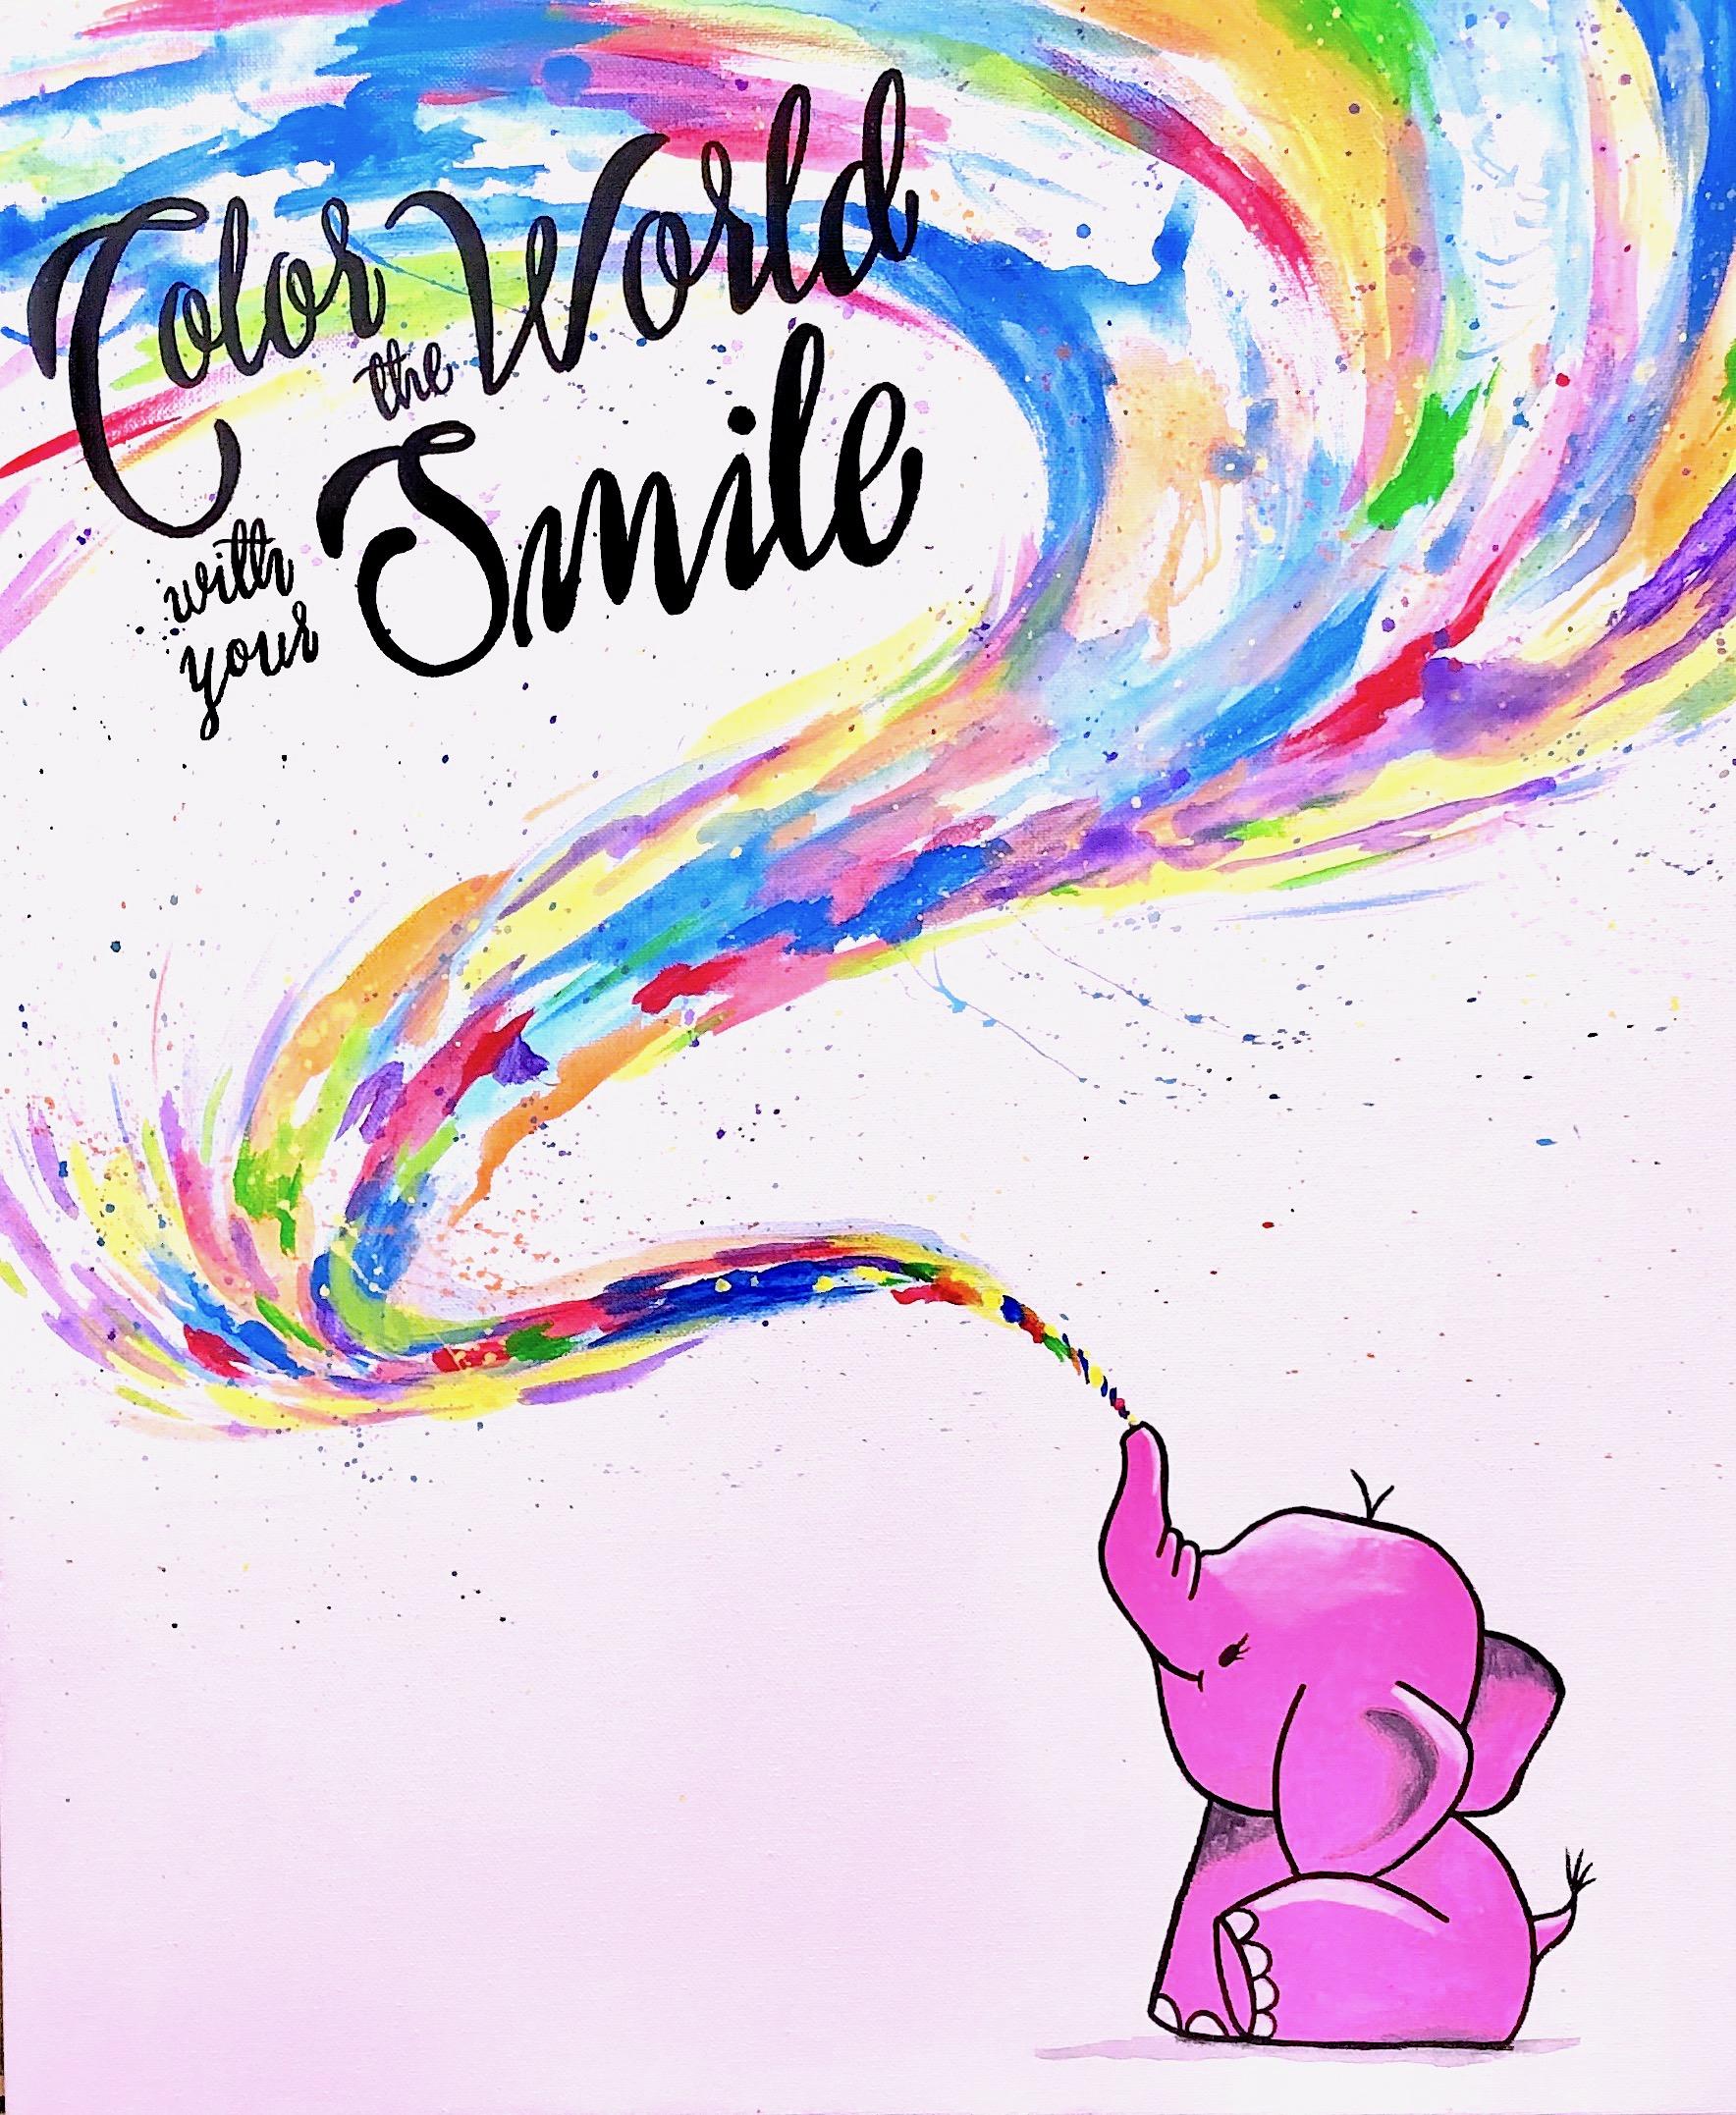 Color-the-world-smile.jpeg